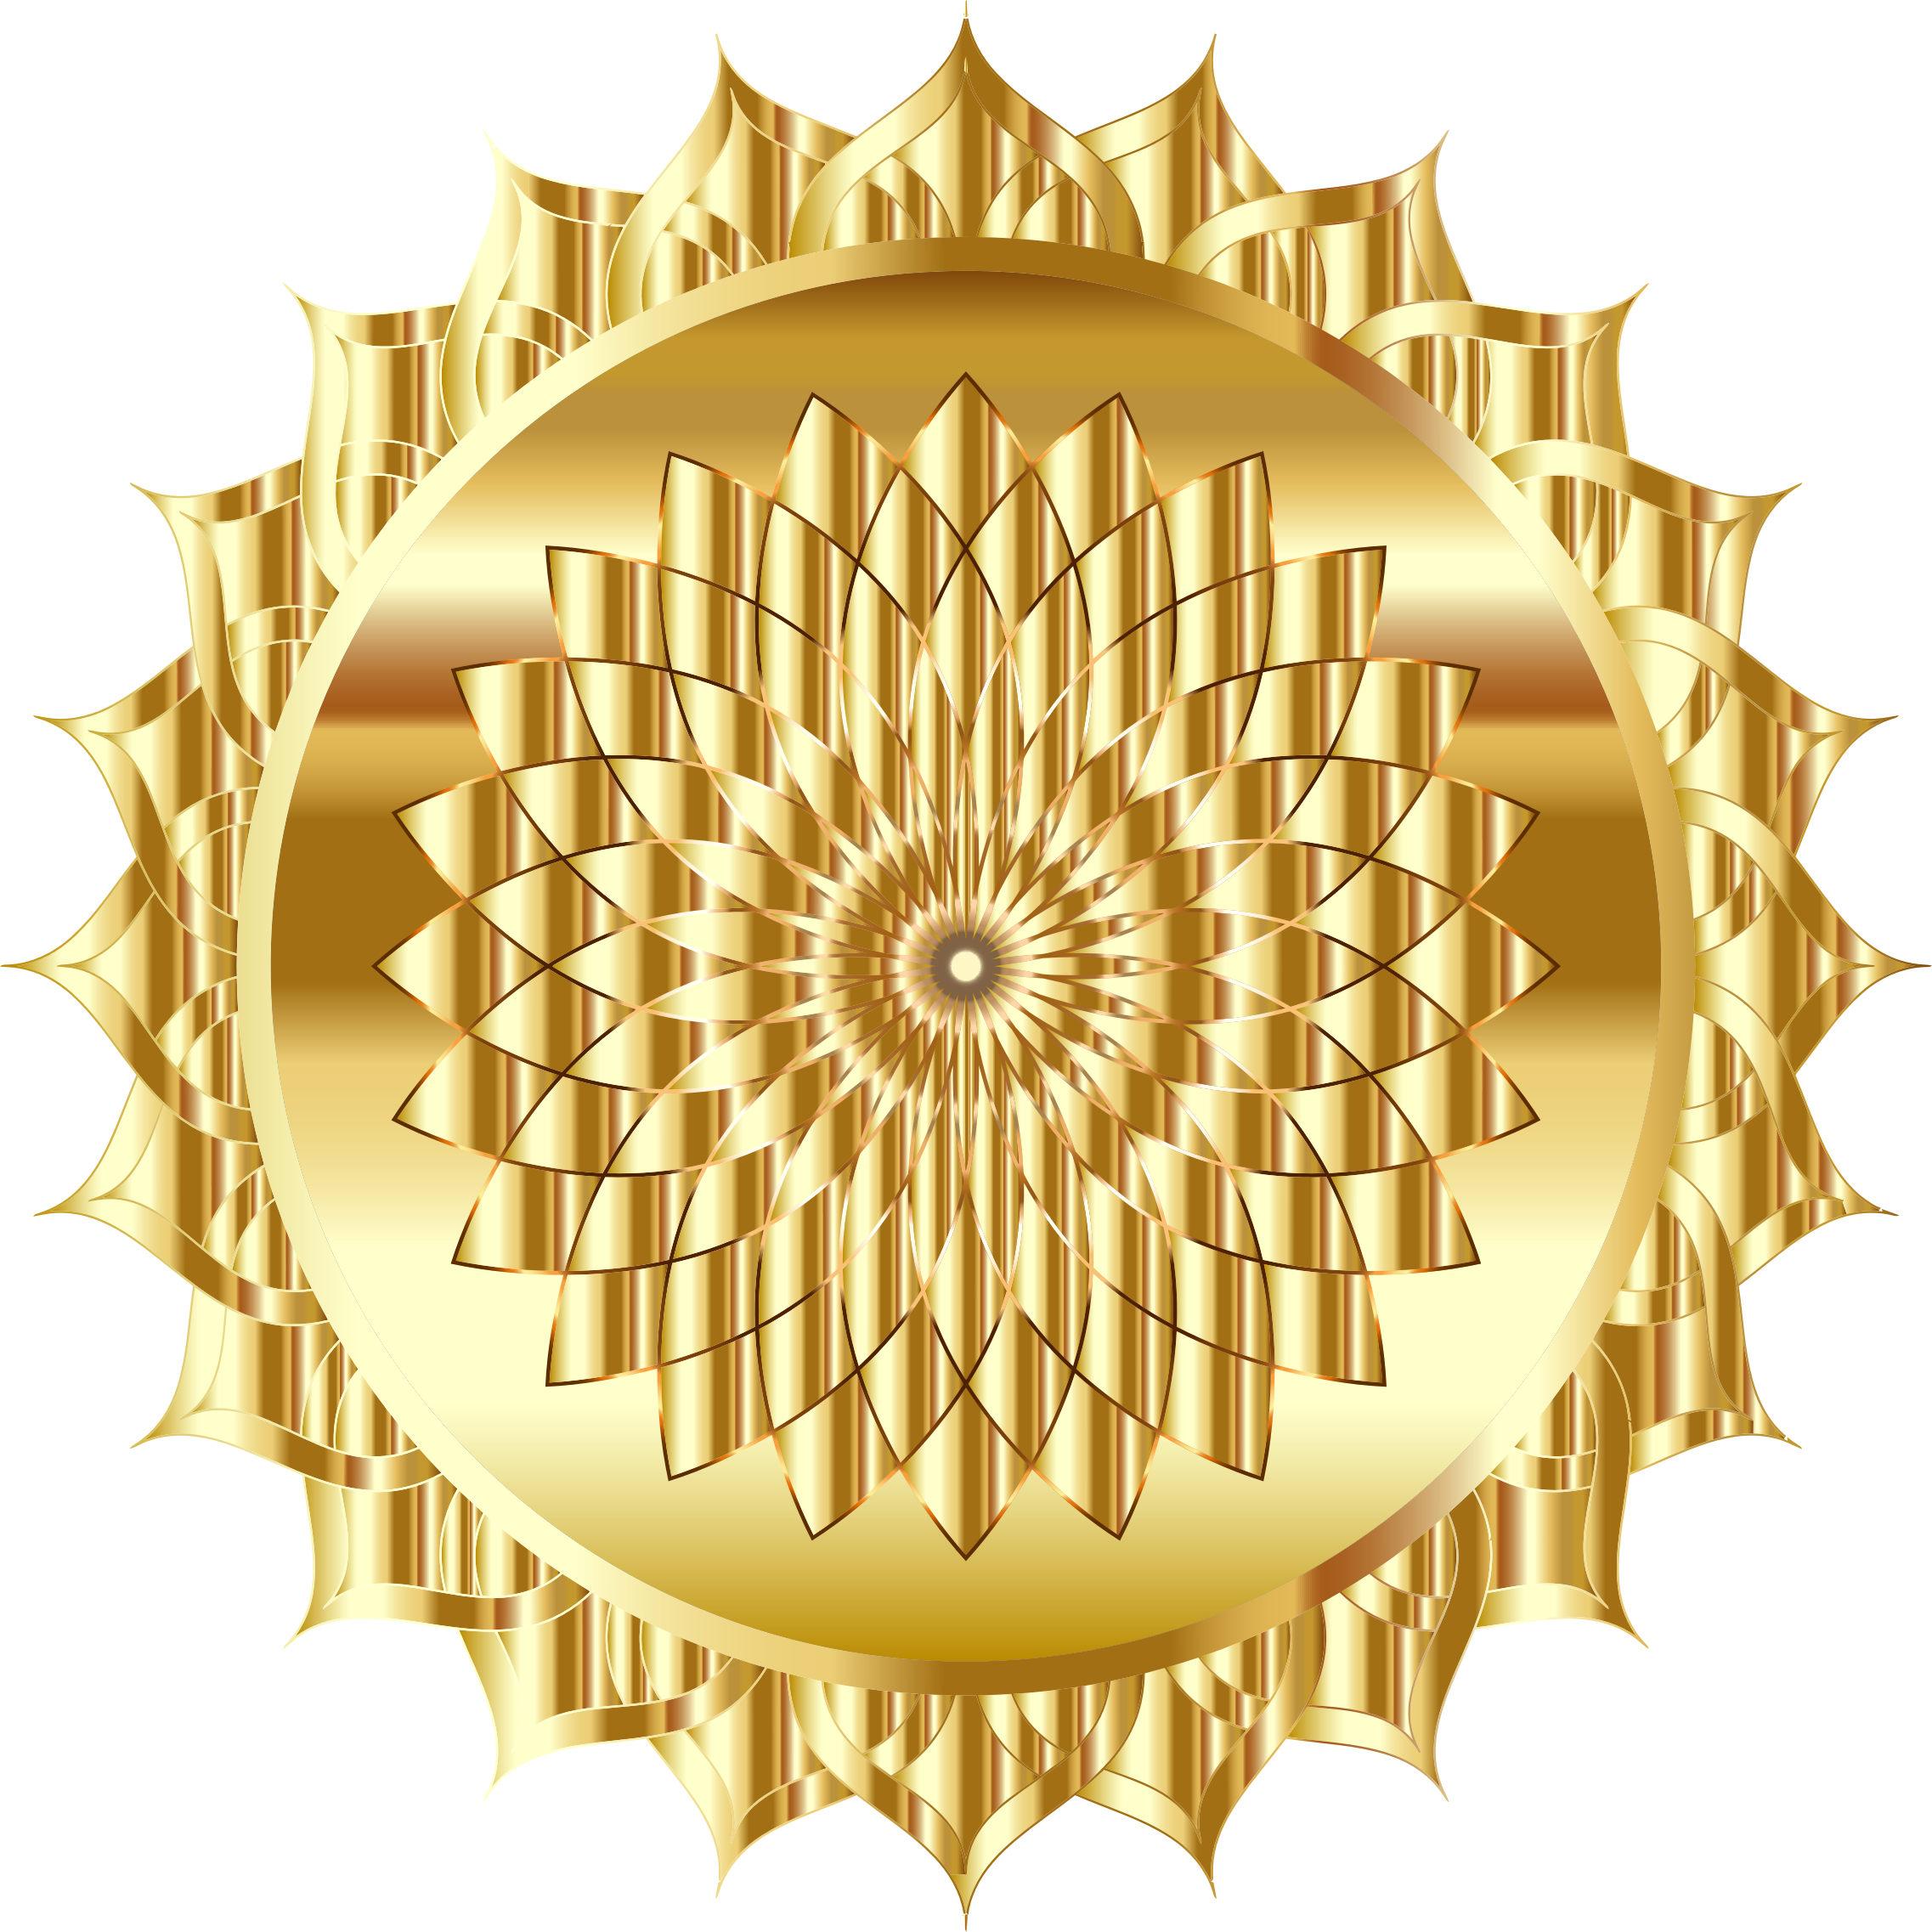 Golden mandala big image. Gold clipart line art